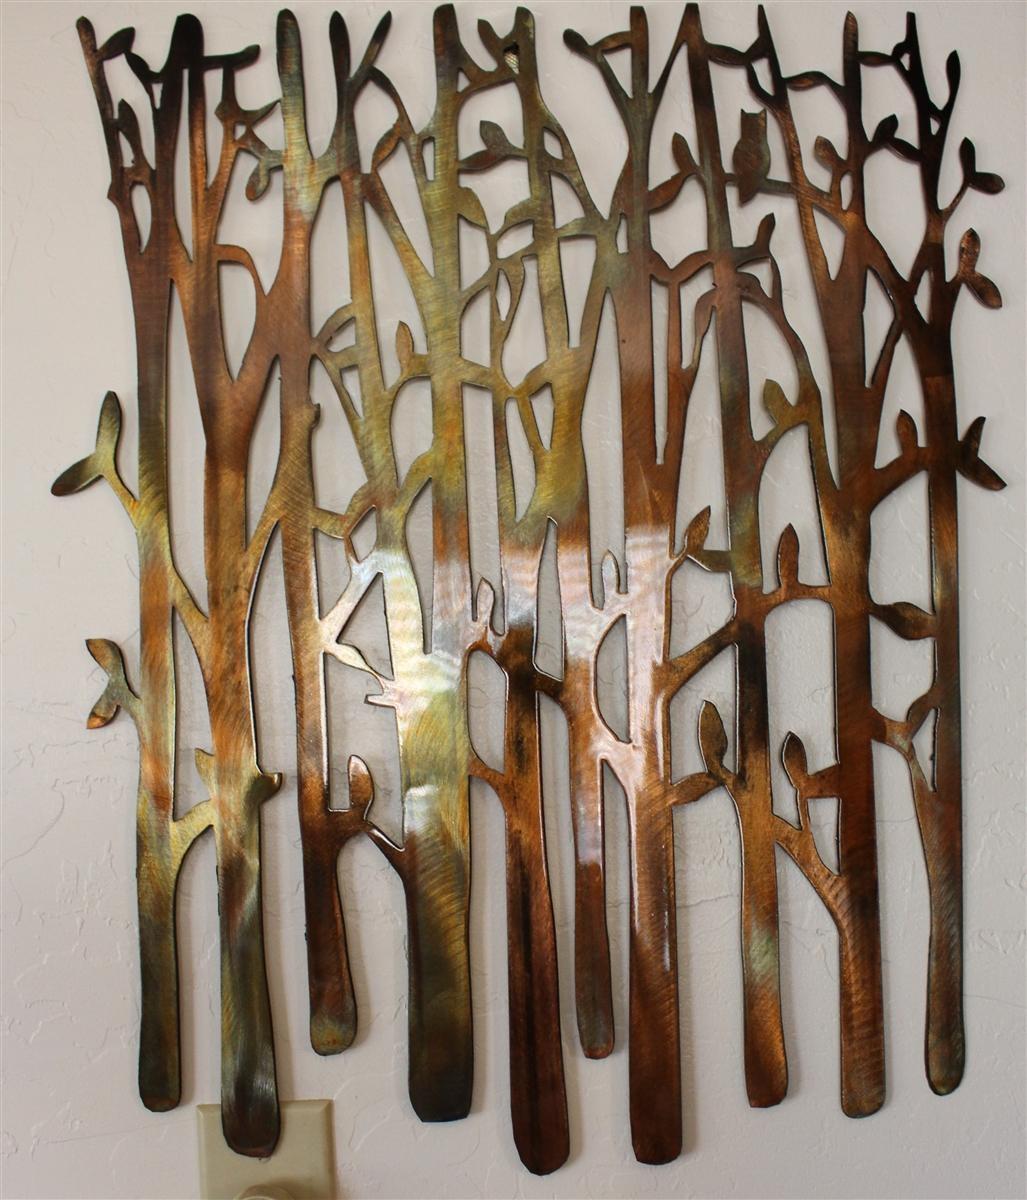 Birch Tree, Birch Tree Metal Art, Bamboo, Bird In The Trees, Bird Regarding Metal Wall Art Trees And Branches (Image 4 of 20)